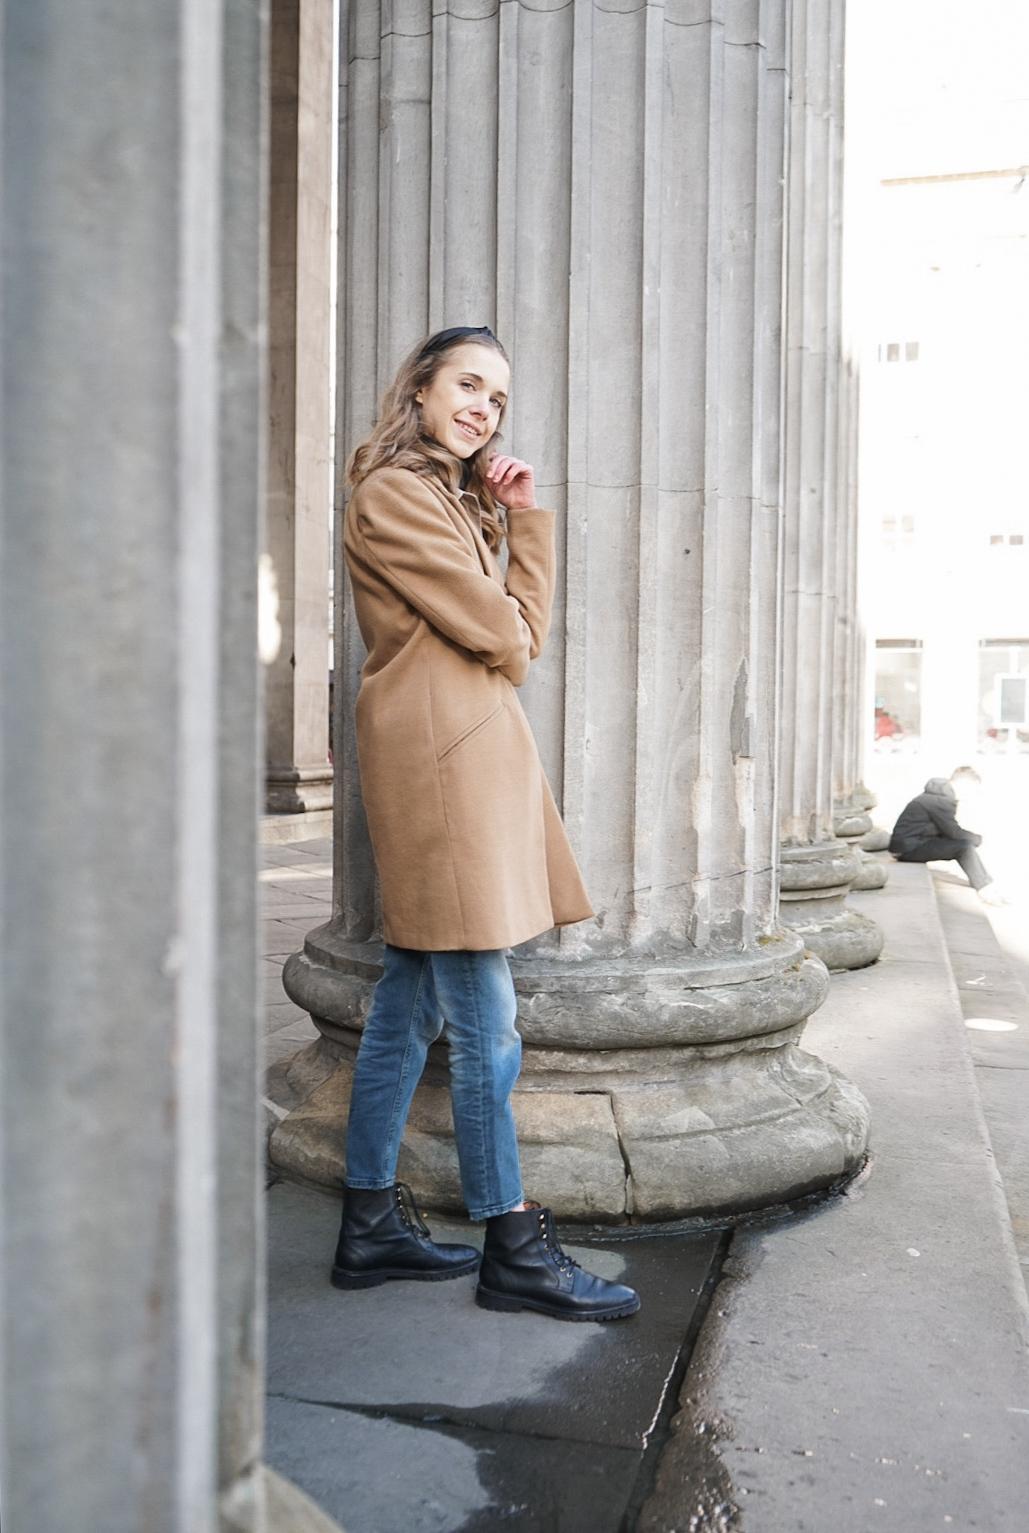 Timeless streetstyle: denim, cashmere knit and camel coat - Ajaton muoti: farkku, kasmirneule ja kamelitakki